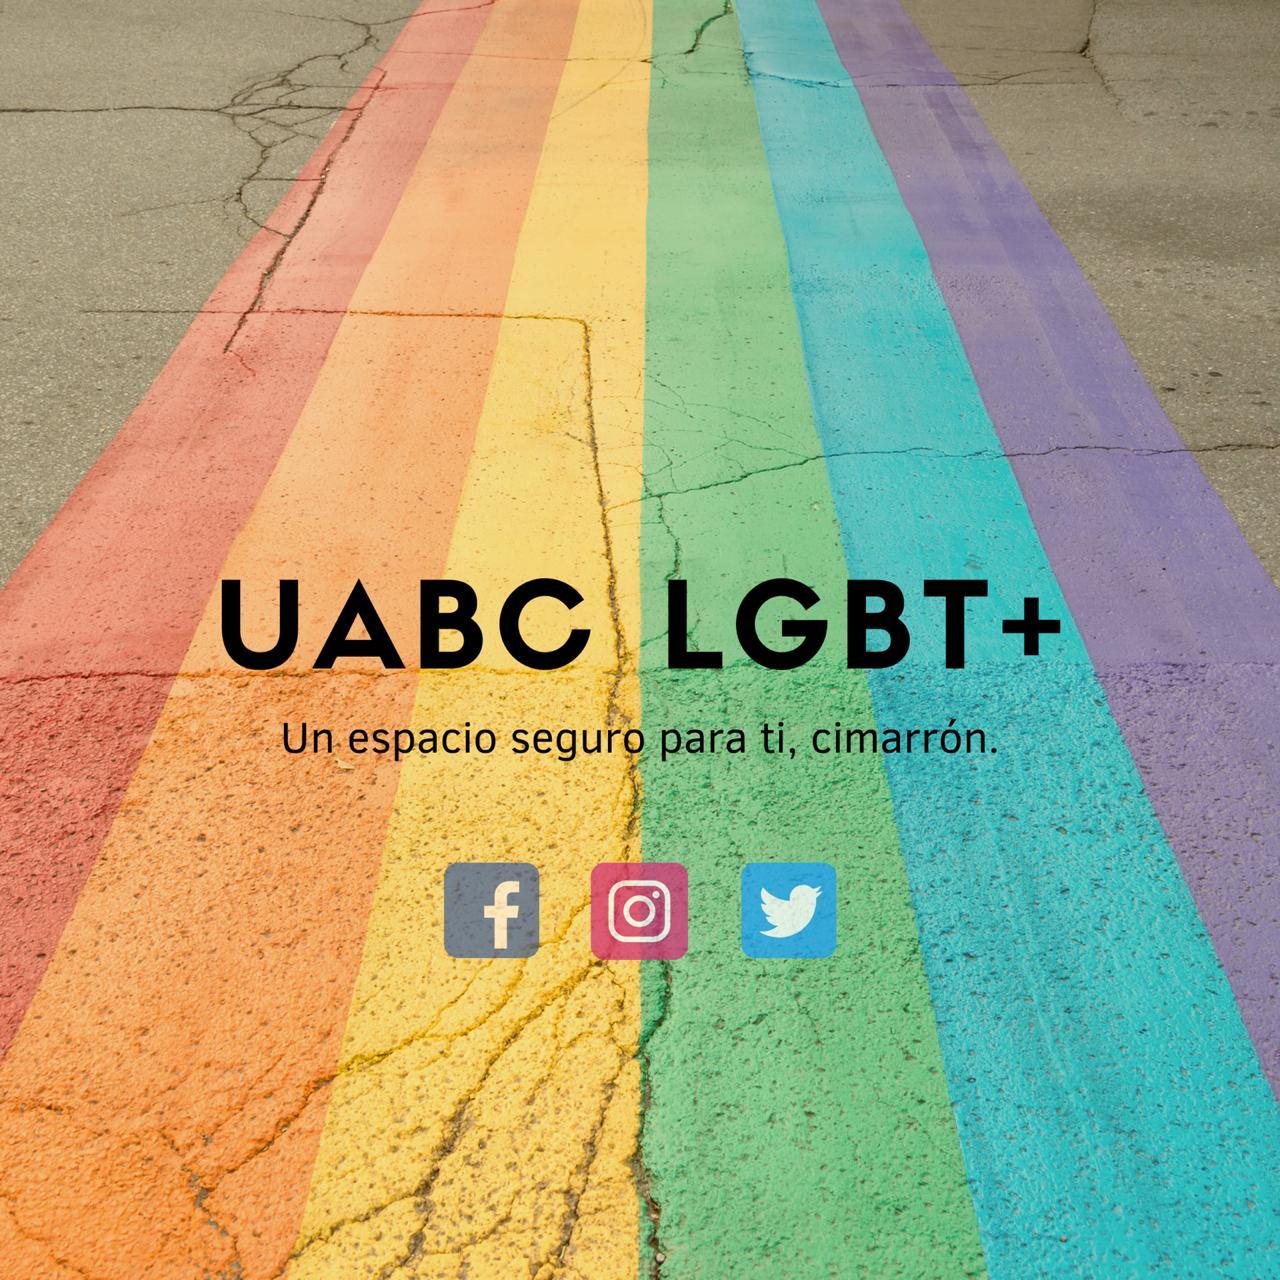 uabc-lgbt-2